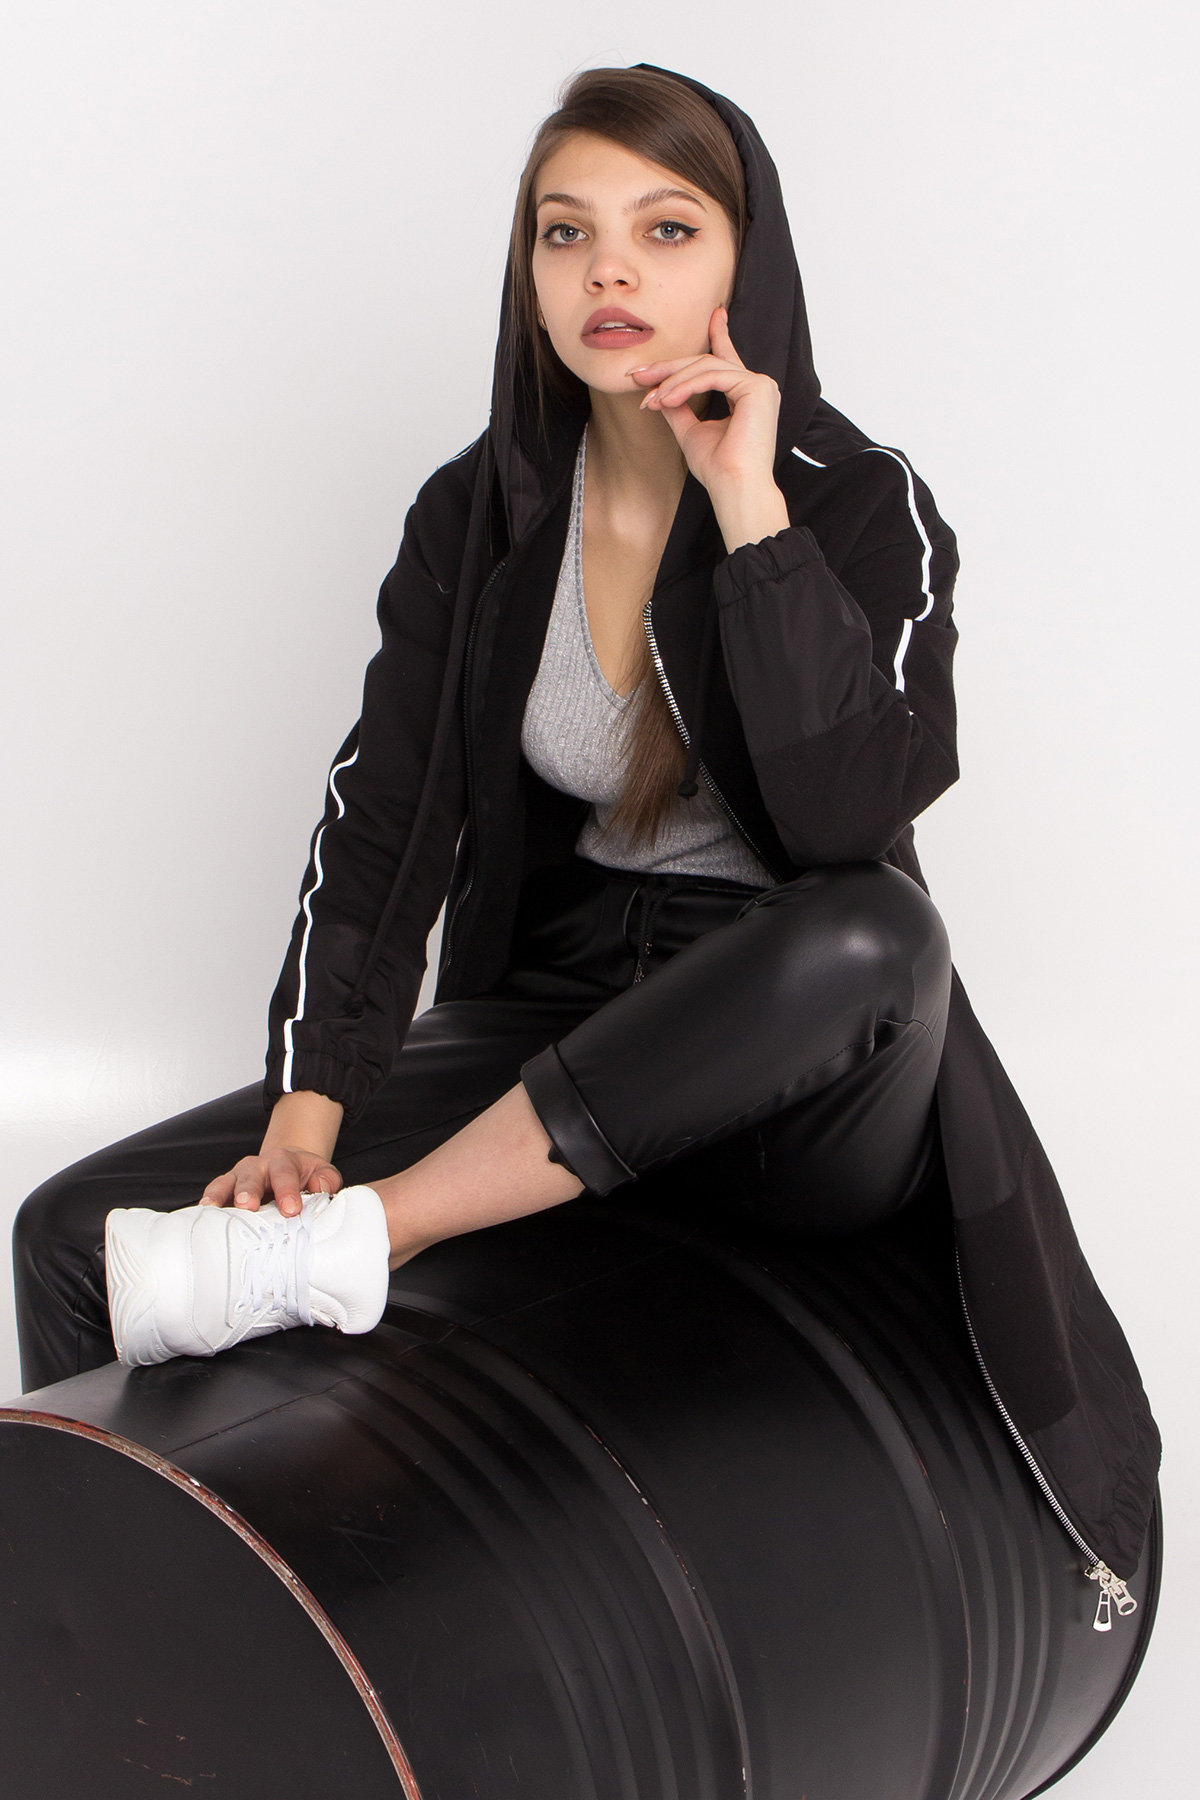 Кардиган Турбо 9065 АРТ. 45387 Цвет: Черный - фото 2, интернет магазин tm-modus.ru